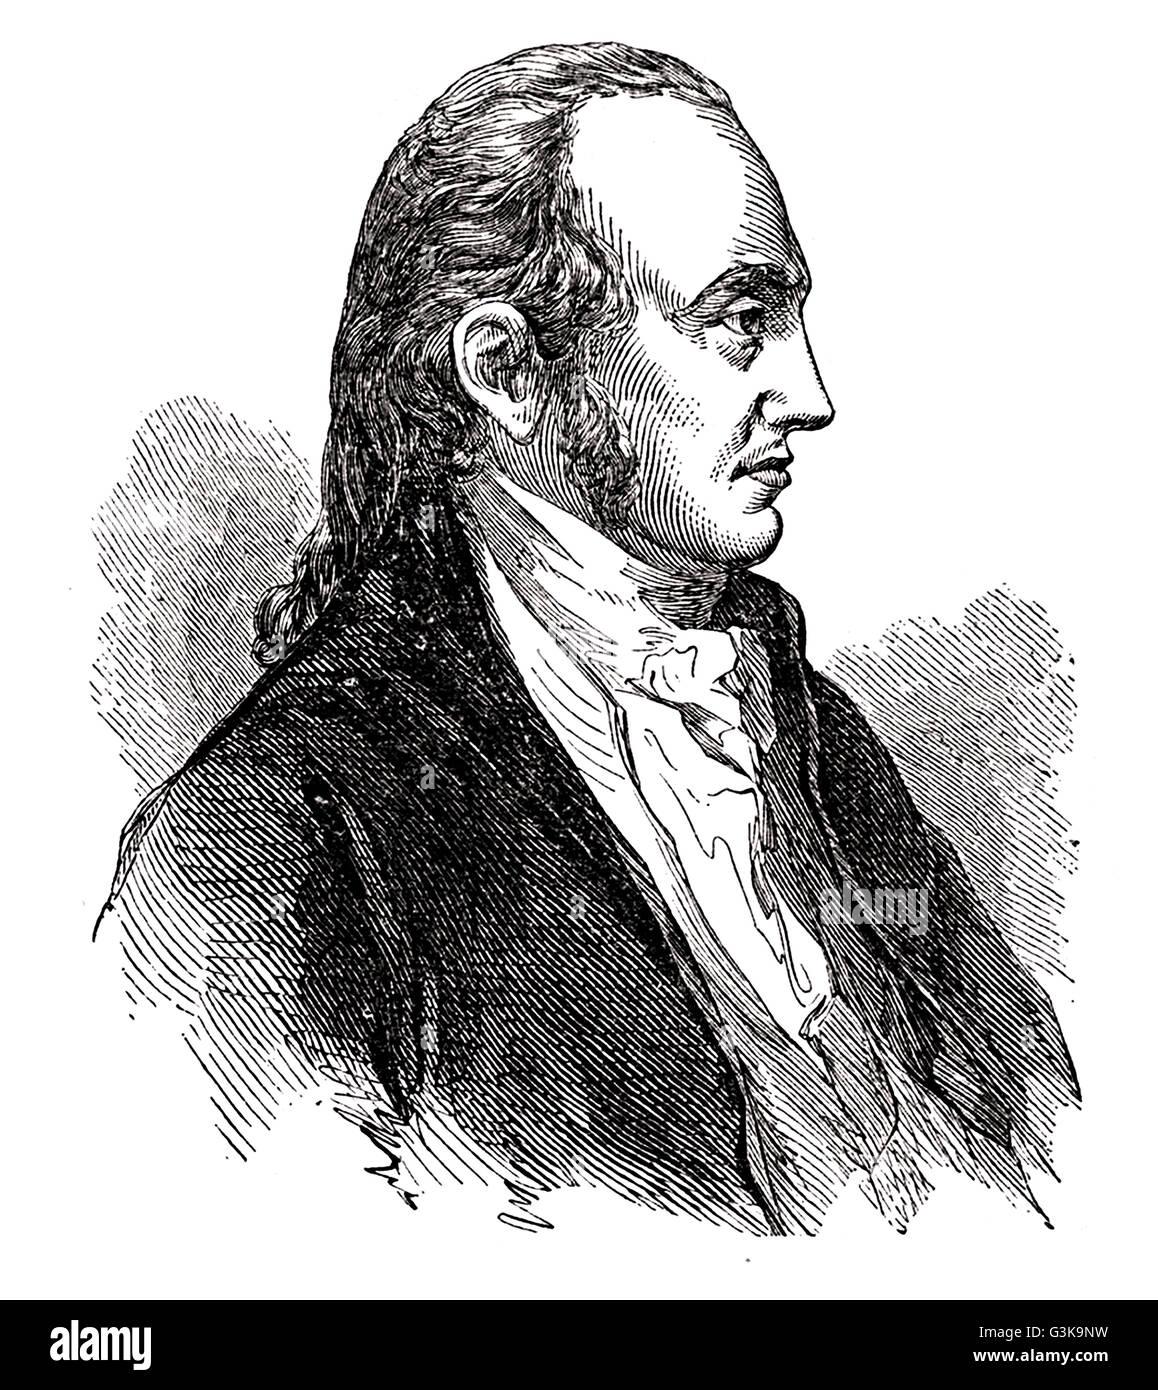 Aaron Burr, 1756 - 1836 - Stock Image